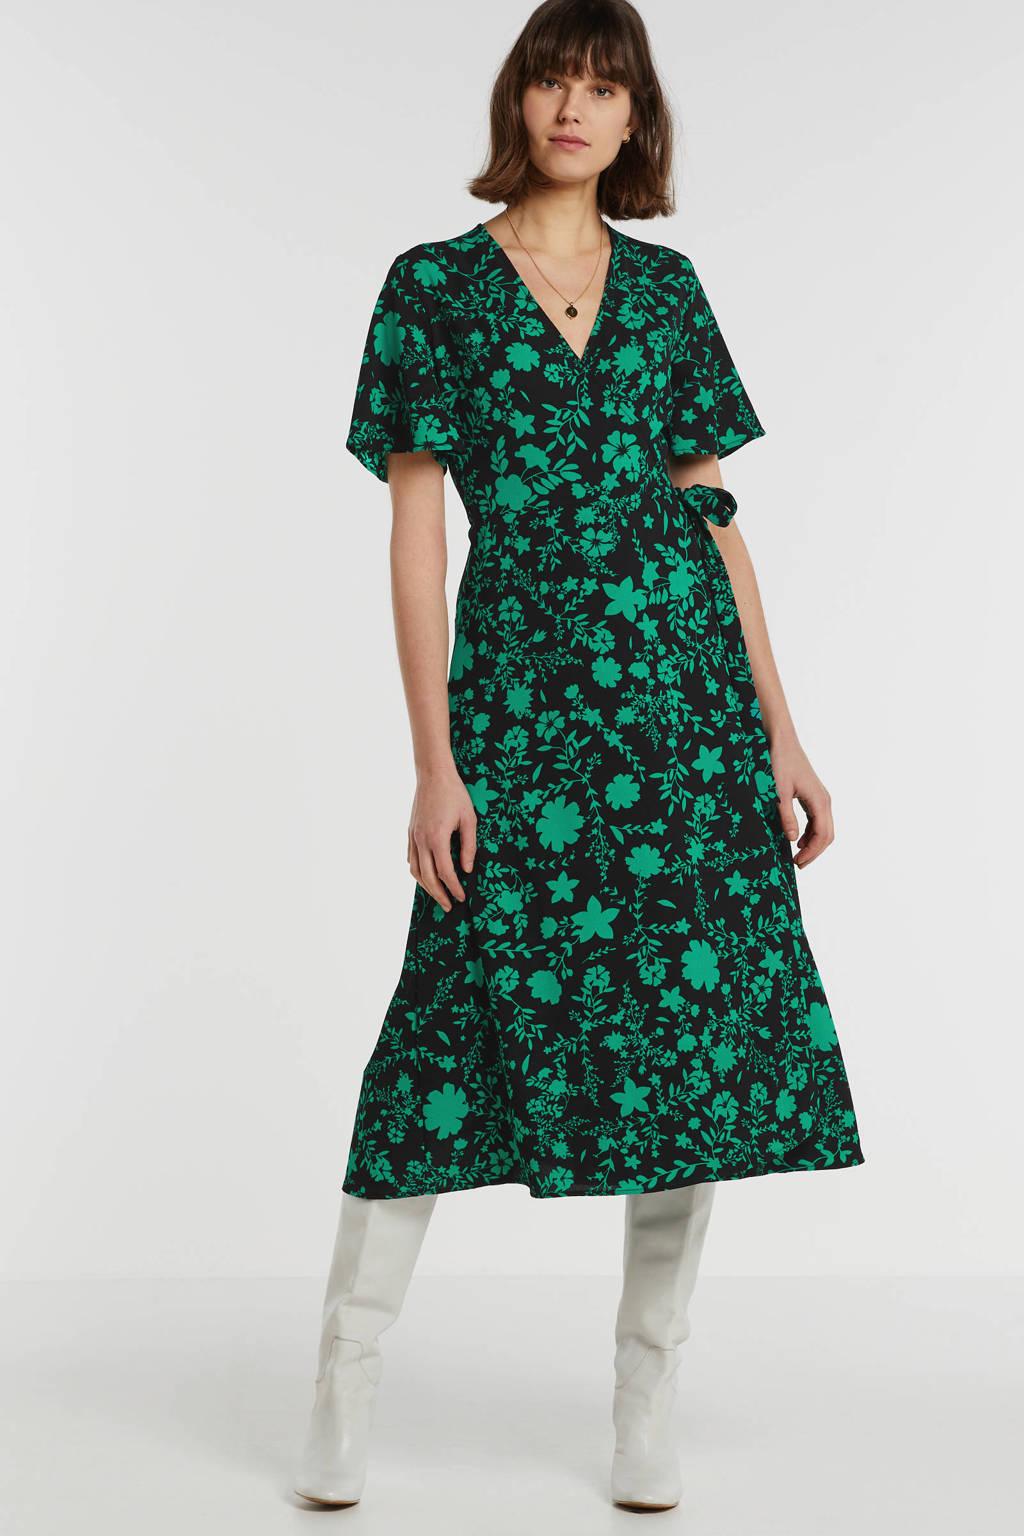 anytime gerecycled polyester wikkeljurk met bloemenprint, Zwart/groen